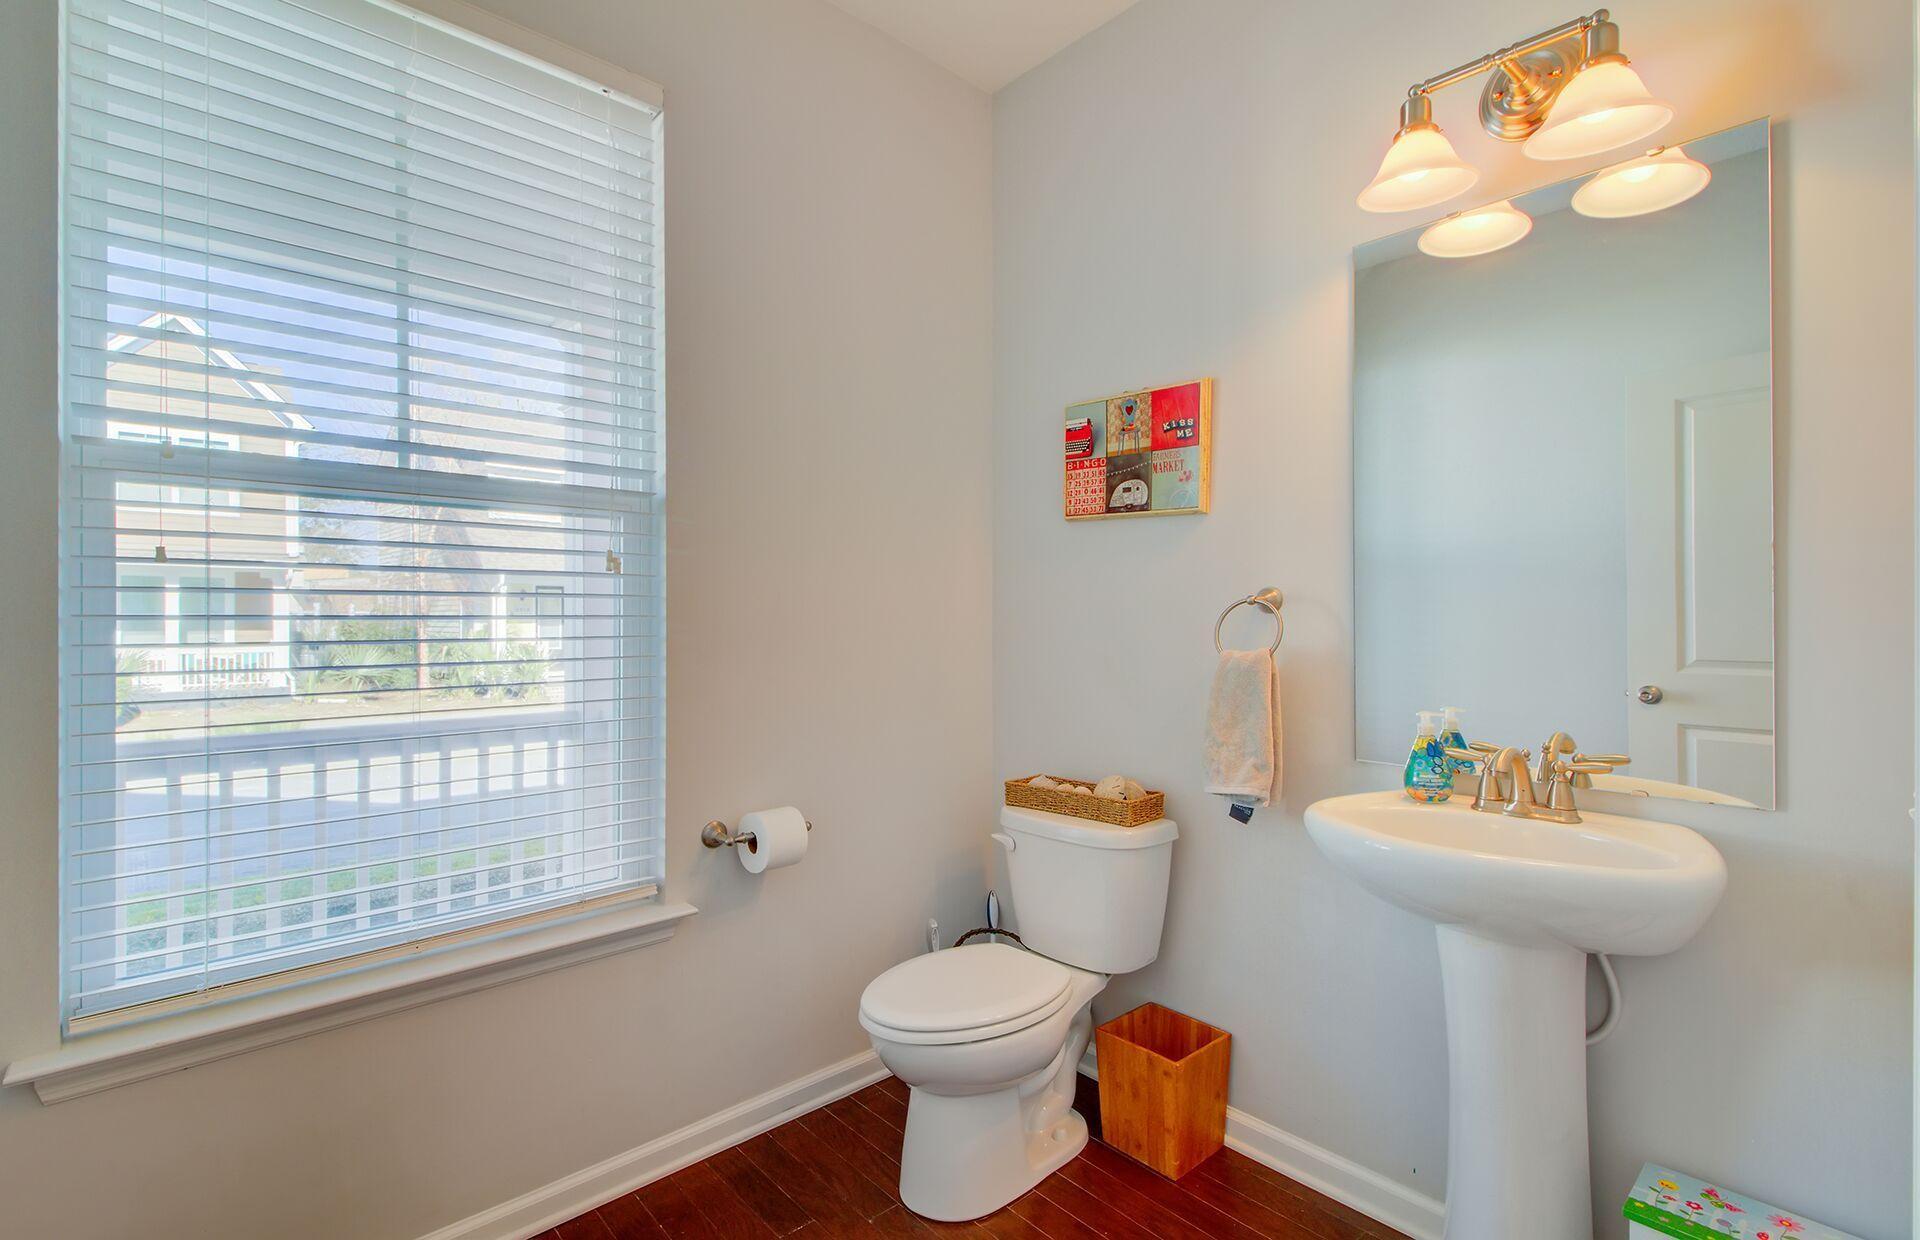 Oak Terrace Preserve Homes For Sale - 4967 Liberty Park, North Charleston, SC - 7